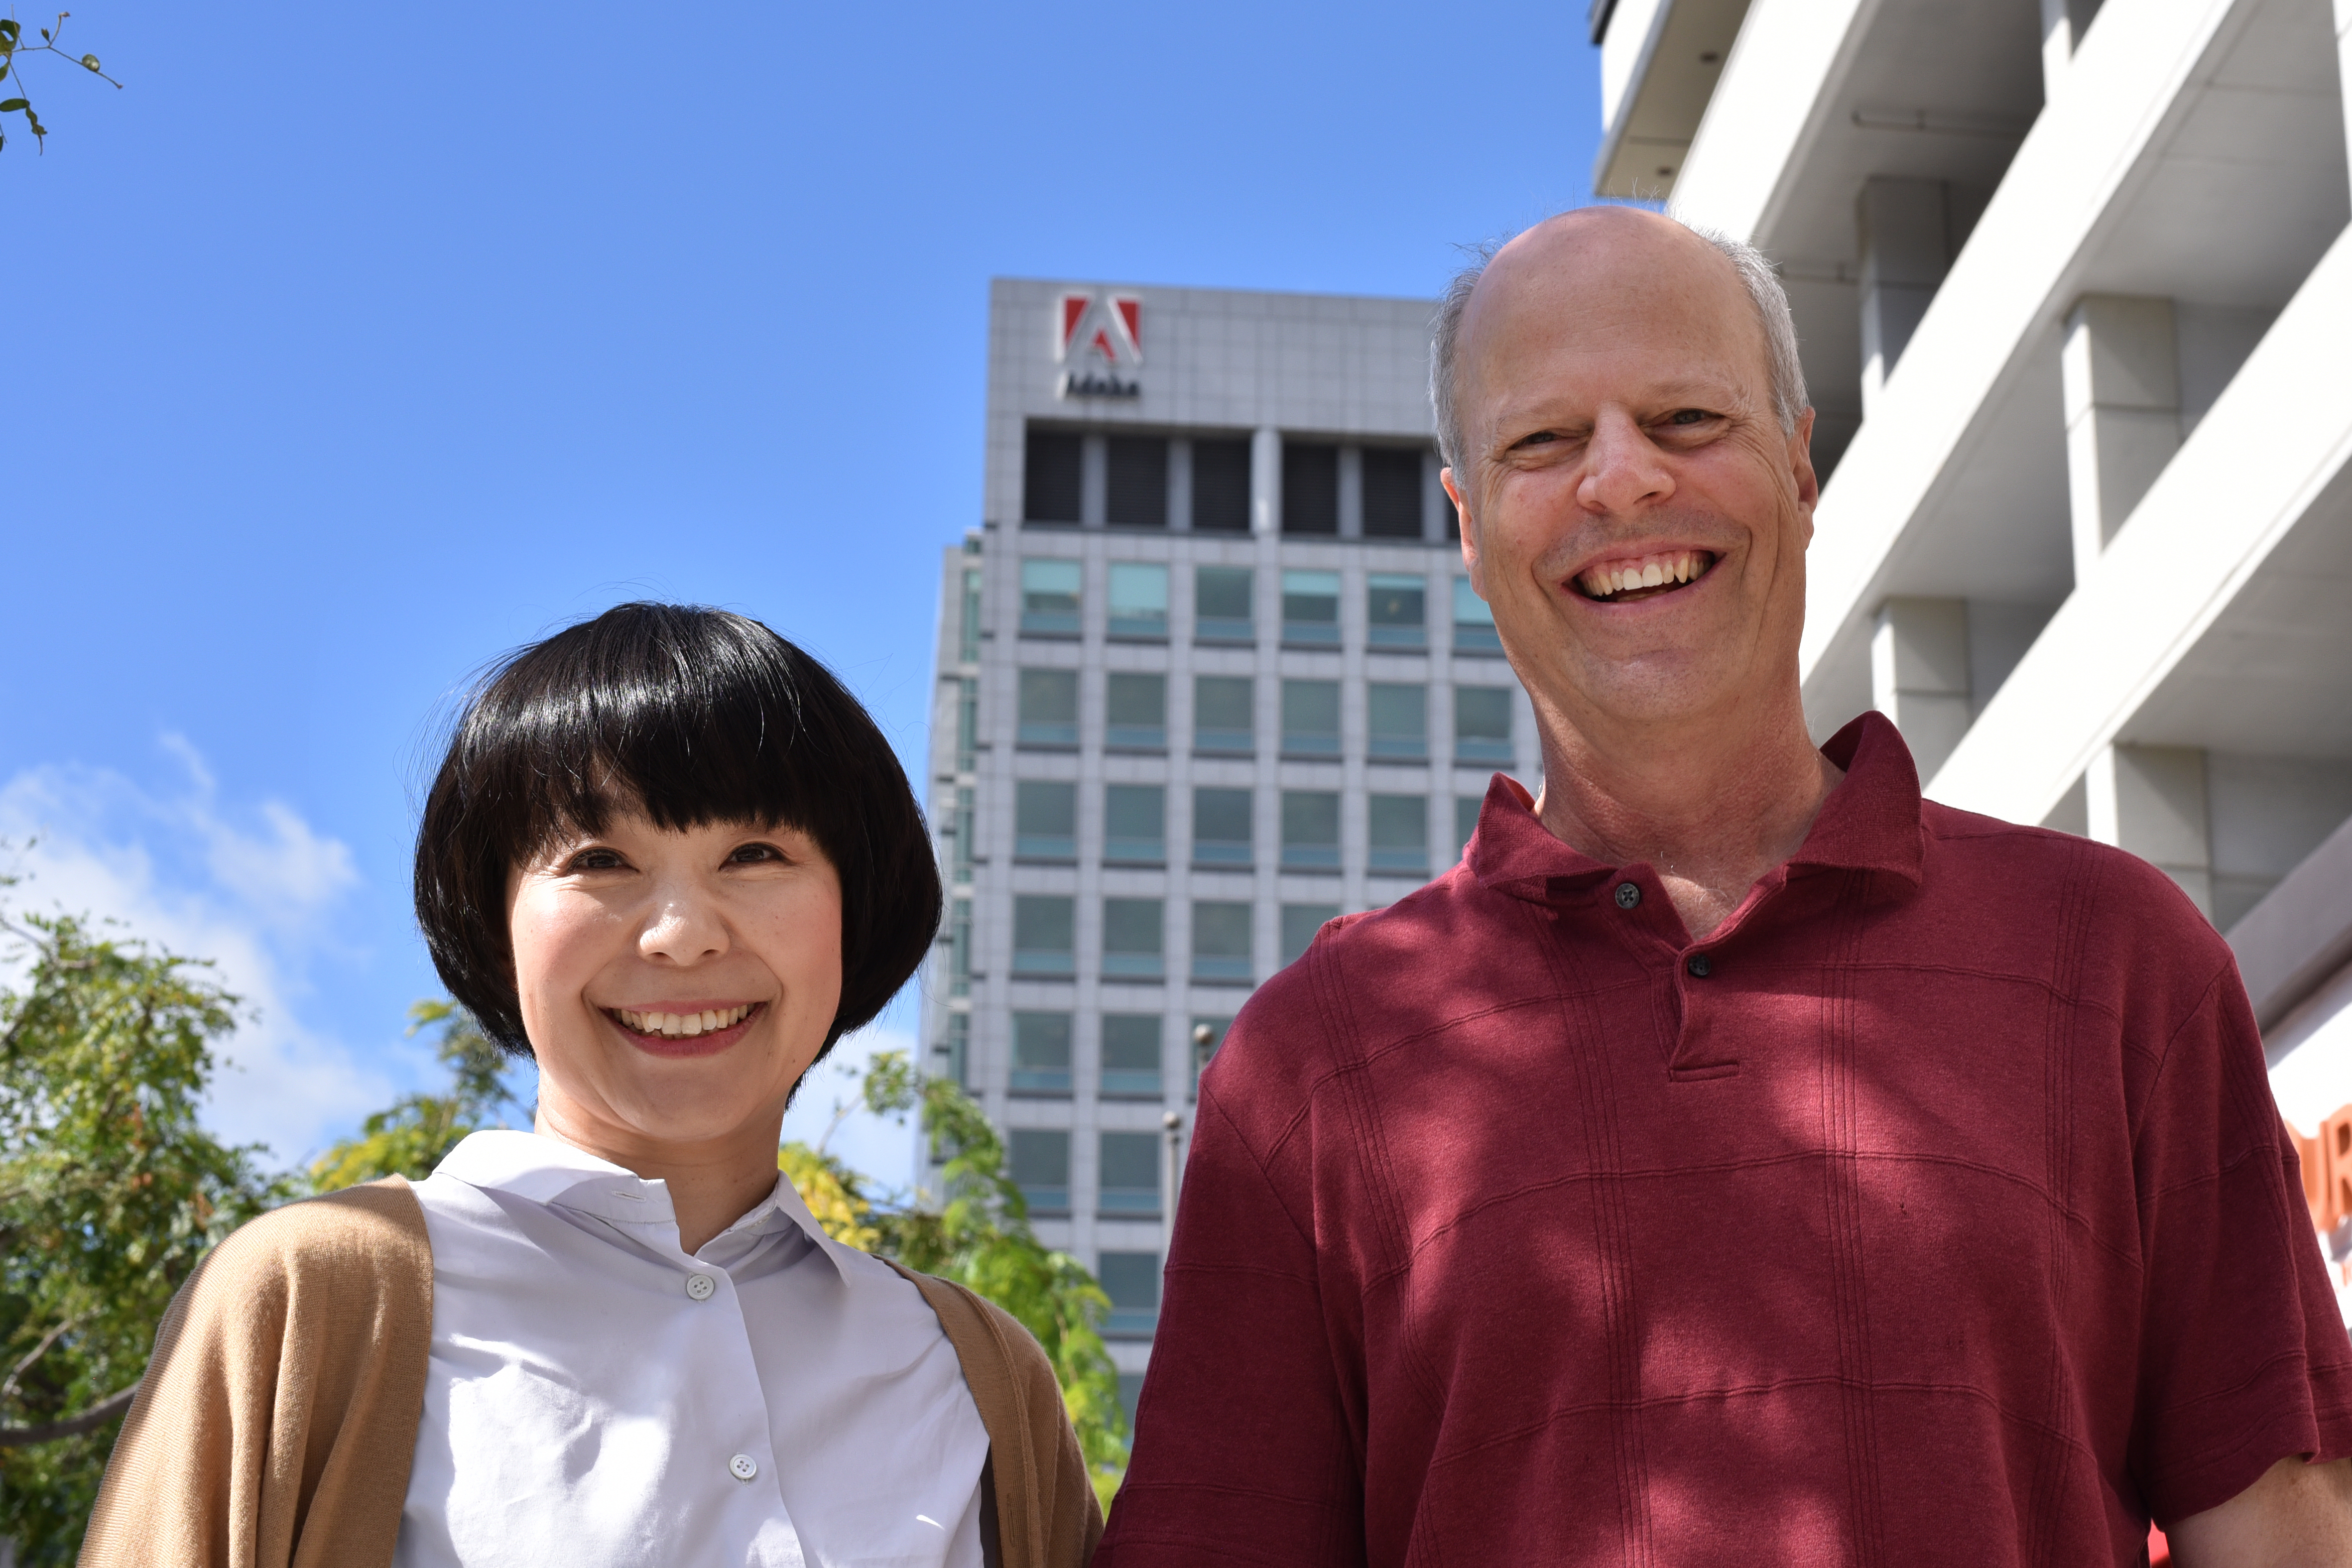 Ryoko Nishizuka and Robert Slimbach at the Adobe San Jose office